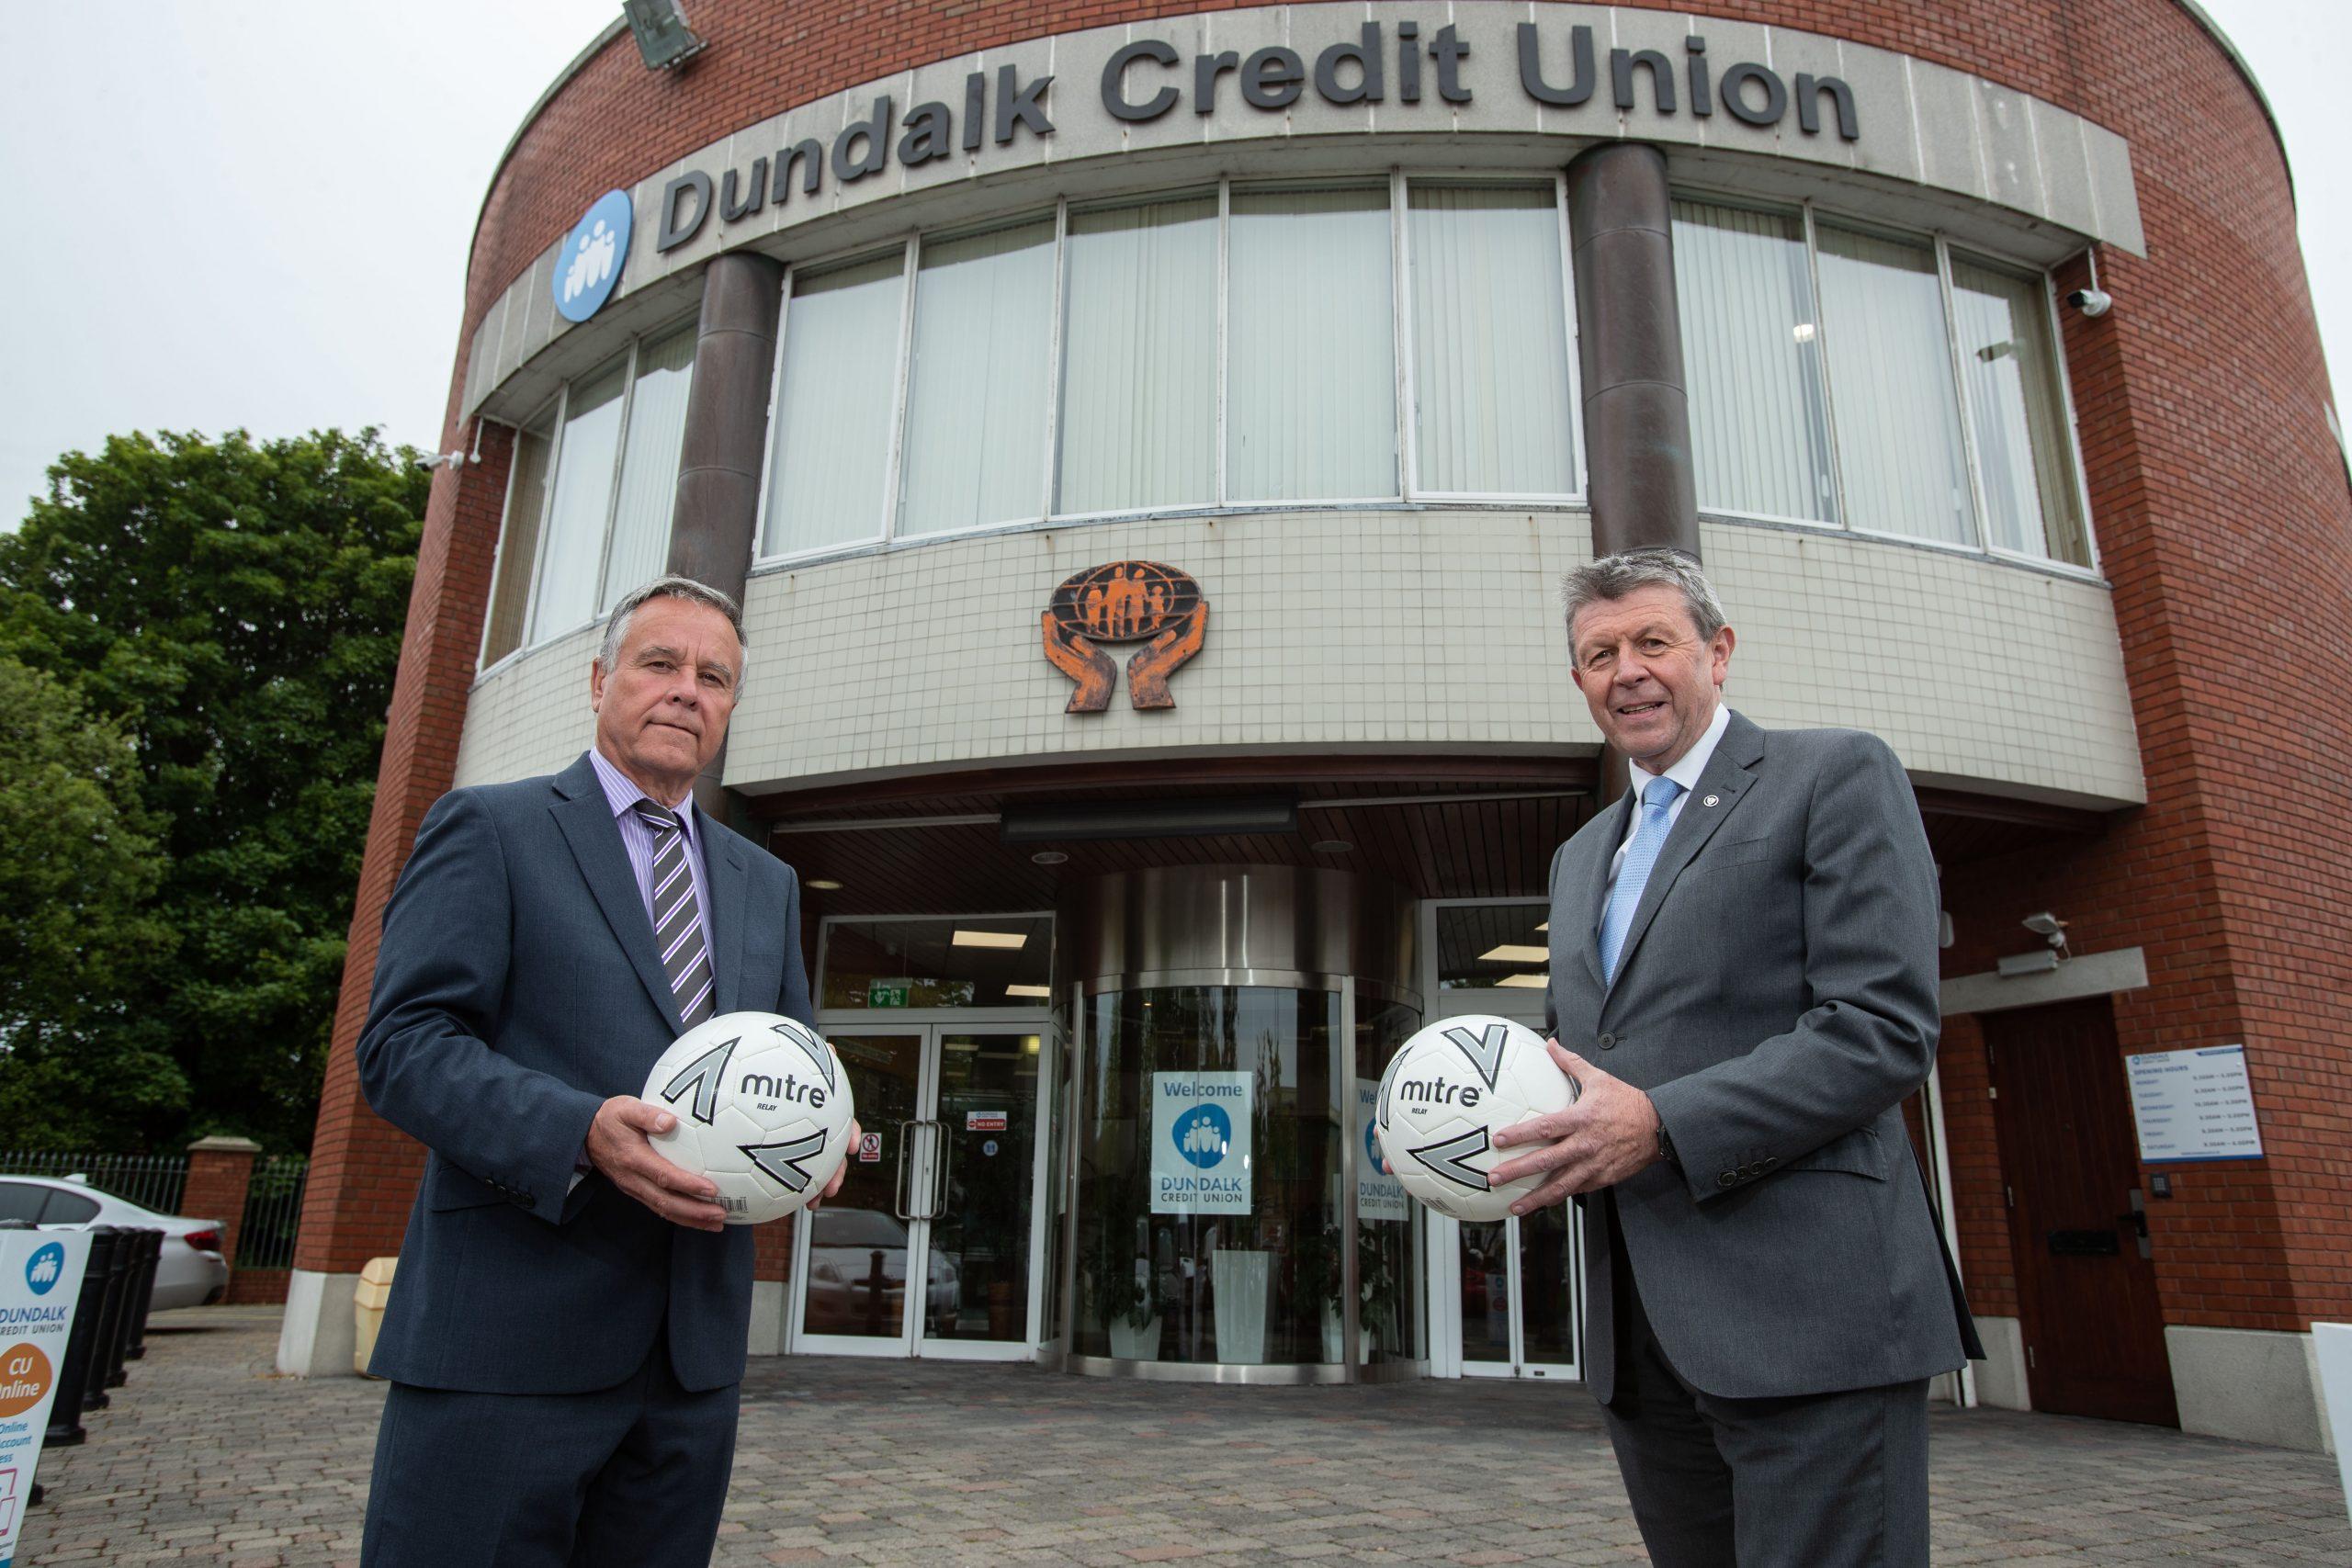 Sponsorship of Dundalk School Boys League